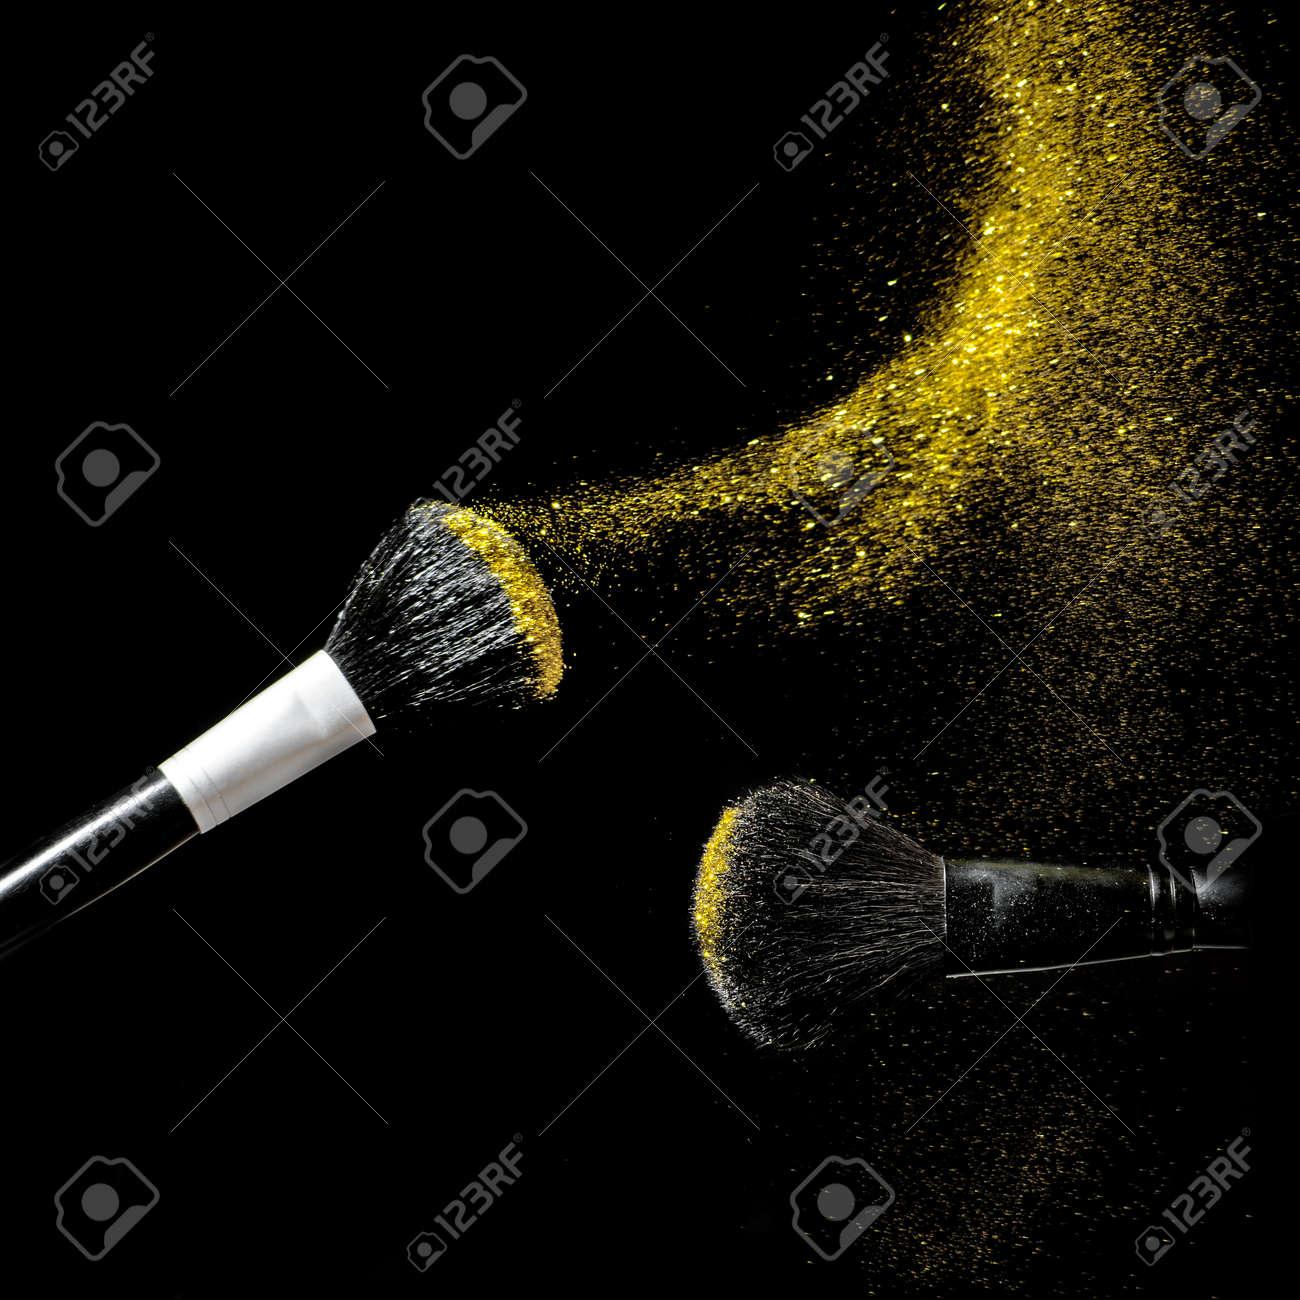 Make-up brush with gold powder explosion on black background. - 140592666